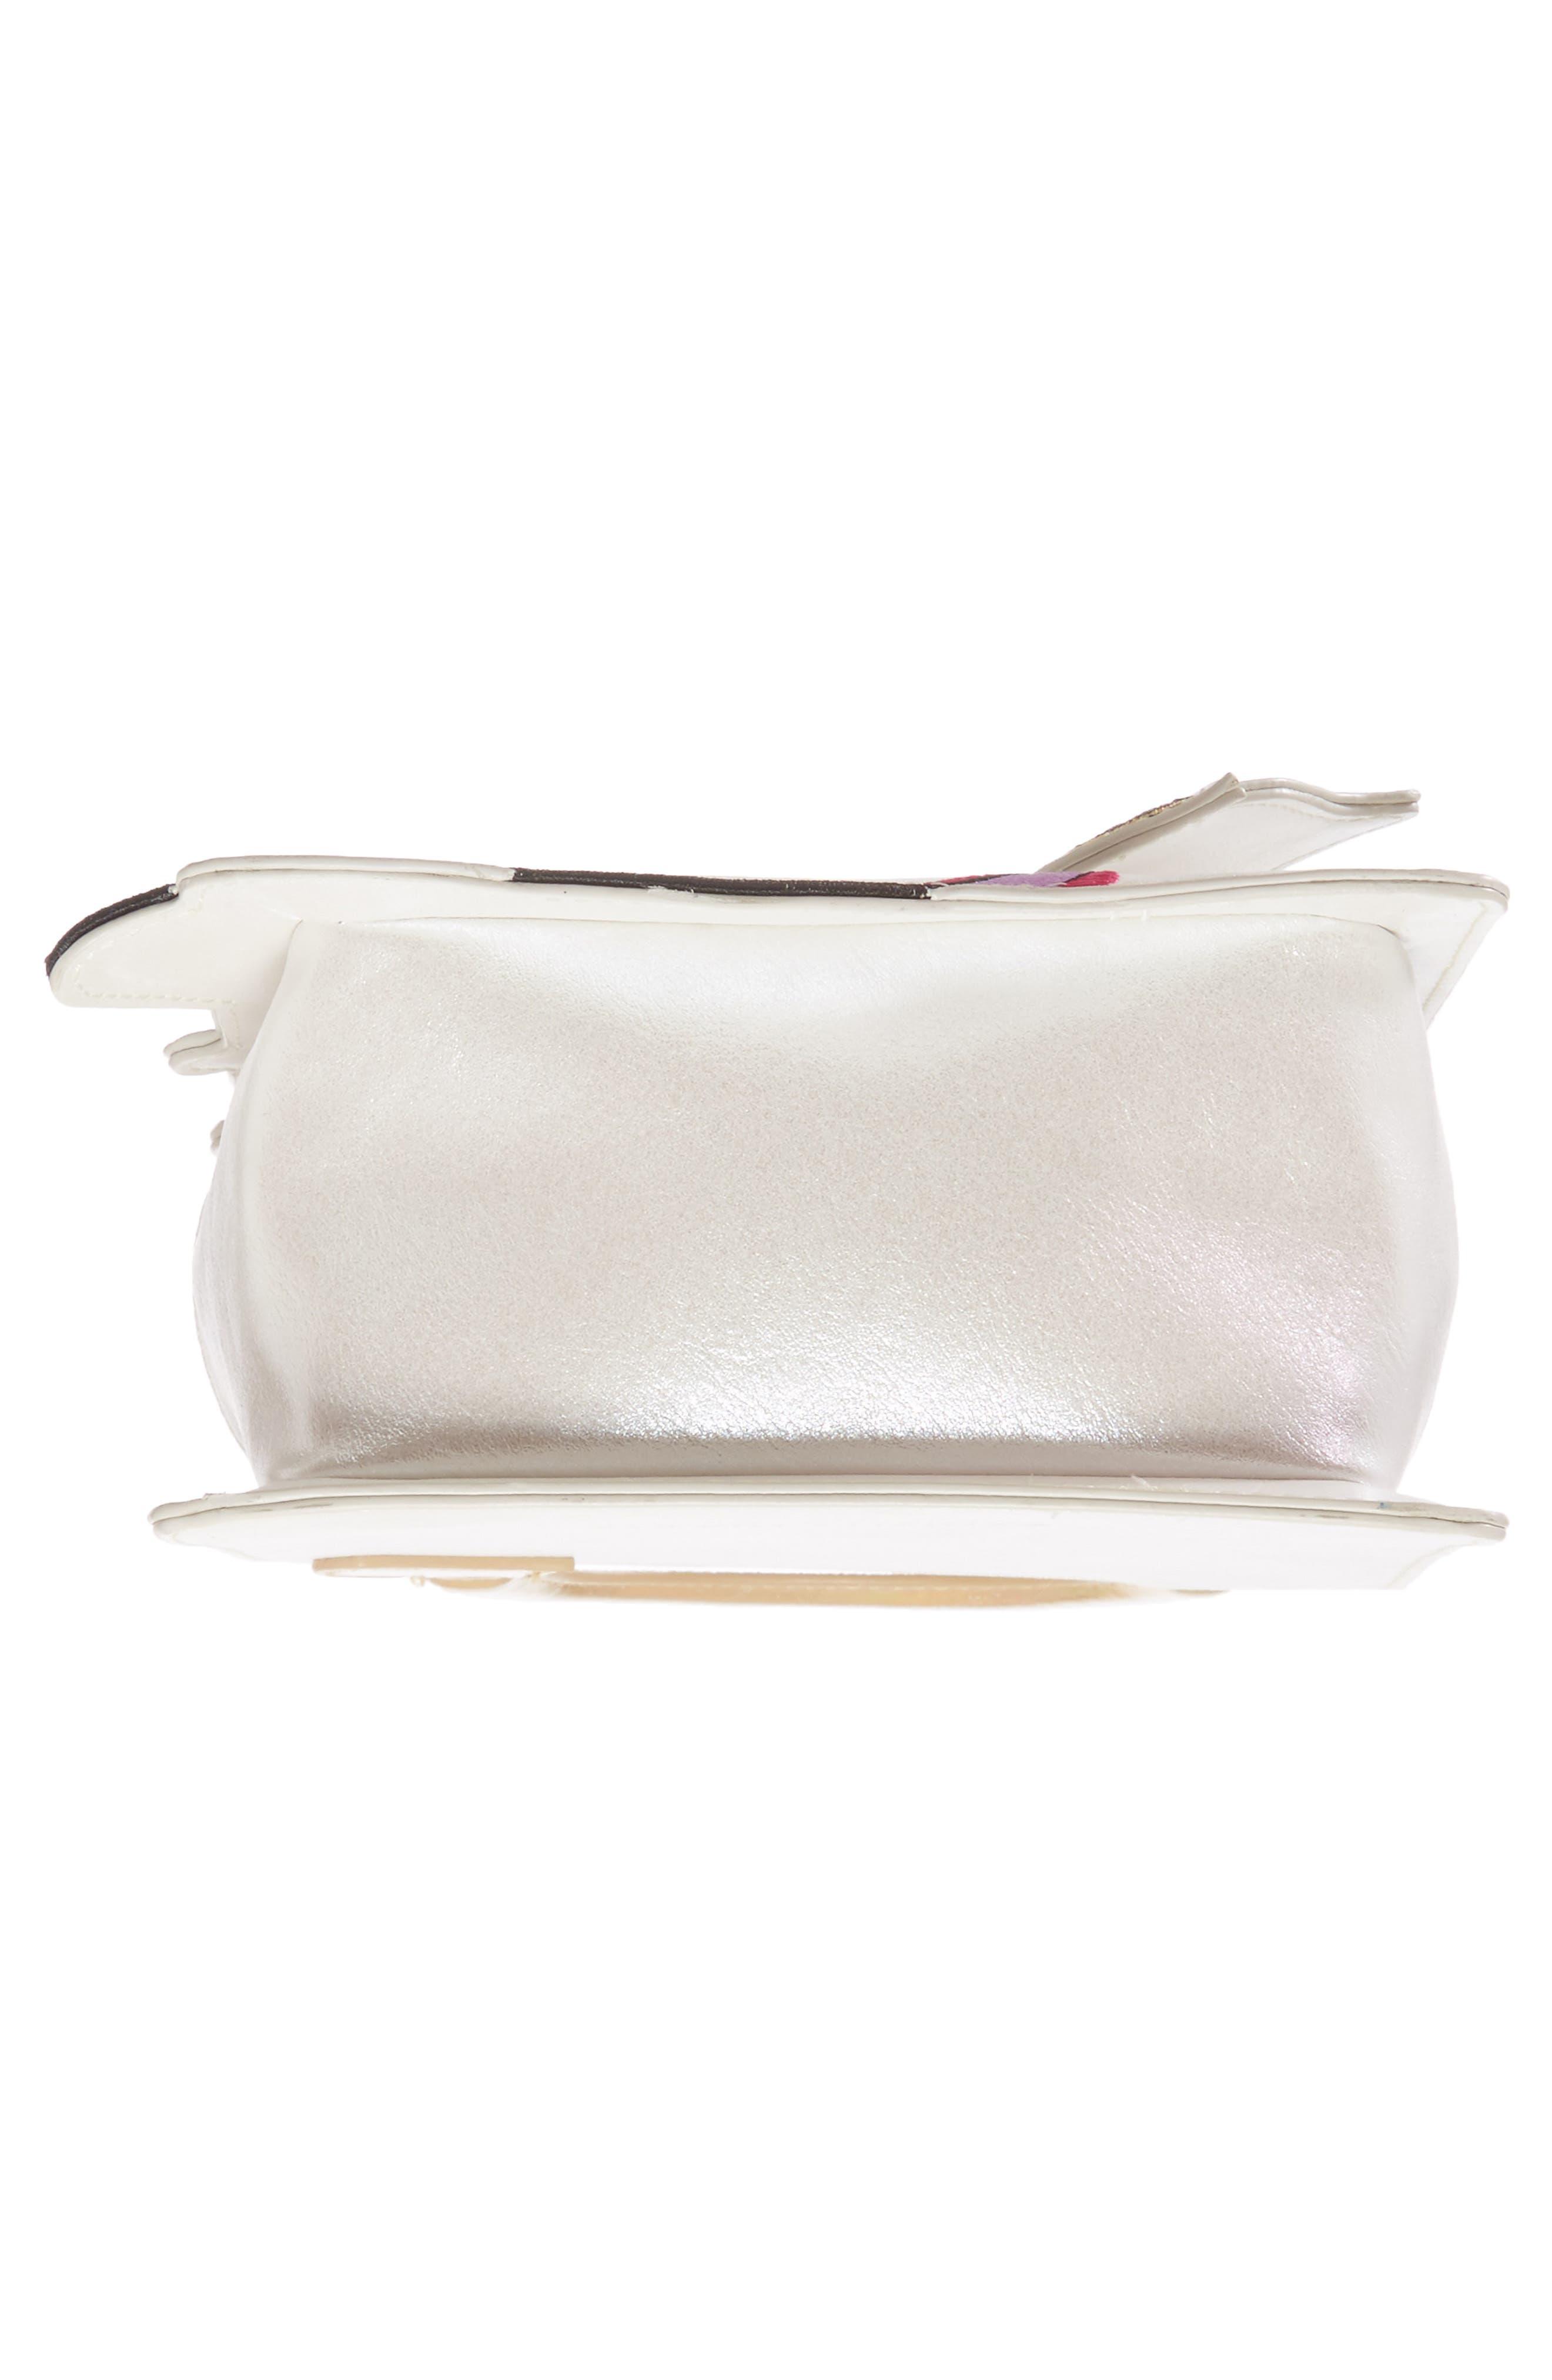 DANIELLE NICOLE,                             x Disney<sup>®</sup> Mrs. Potts & Chip Faux Leather Crossbody Bag,                             Alternate thumbnail 6, color,                             040